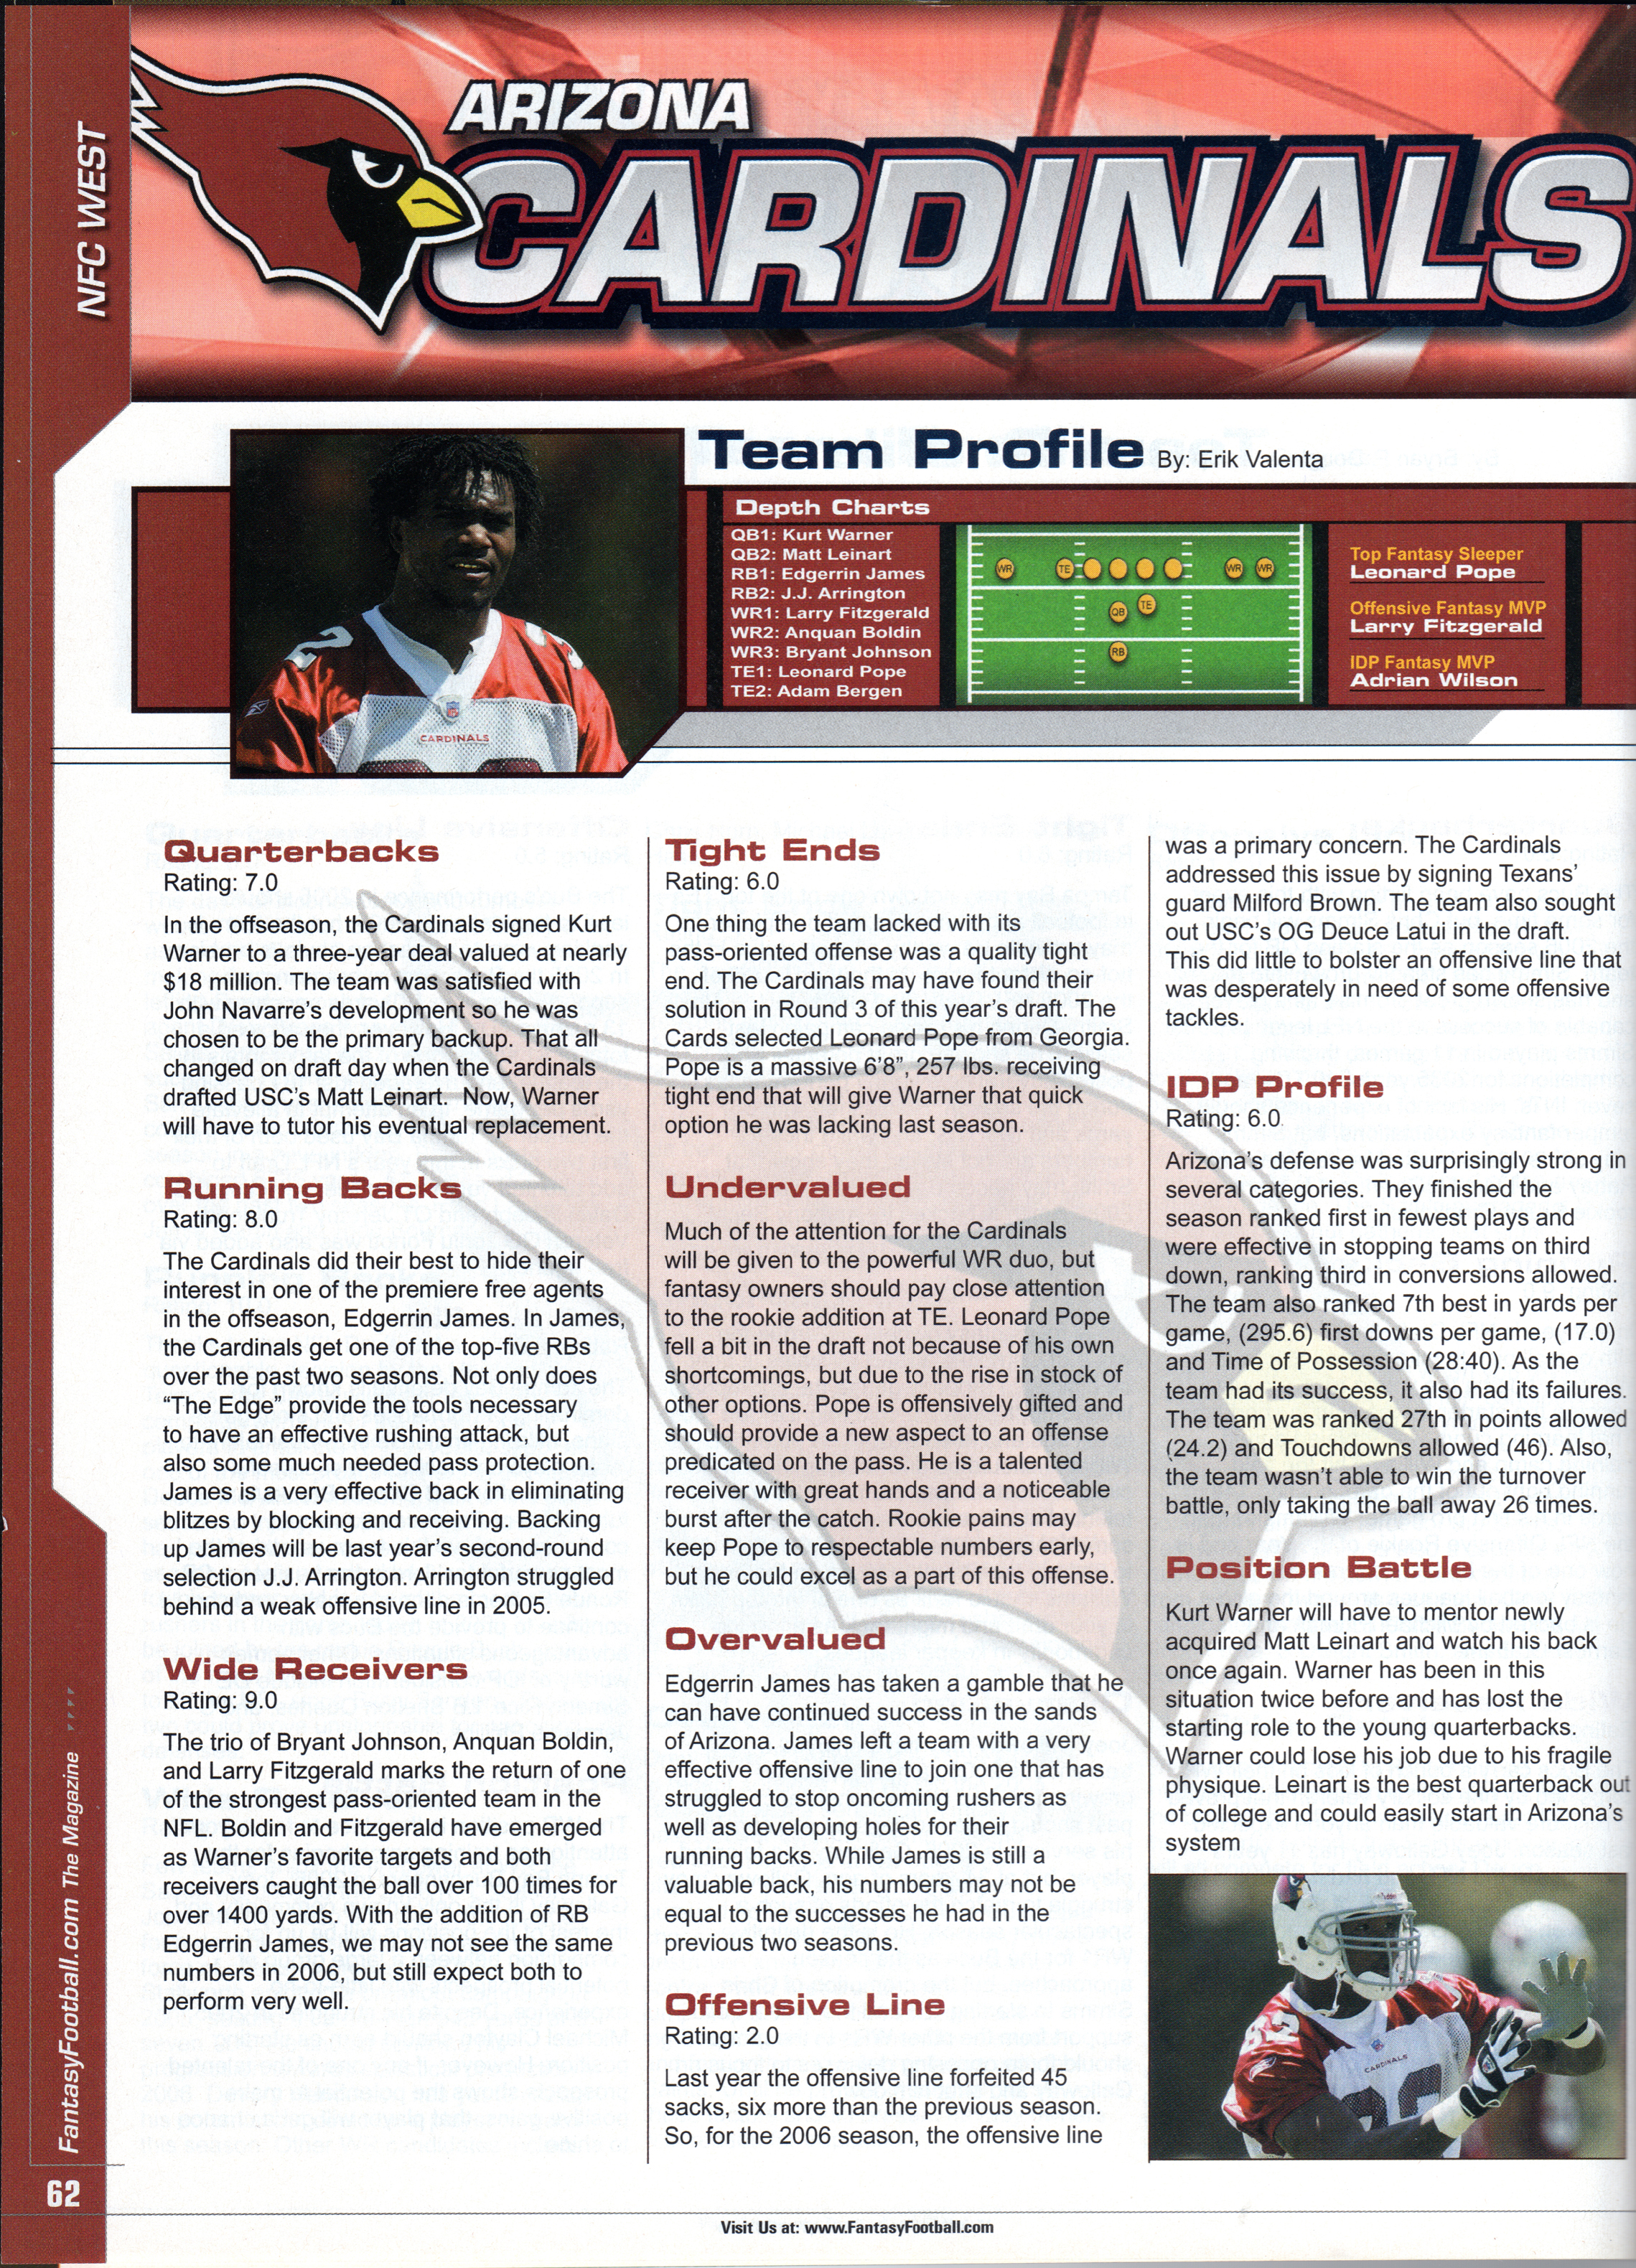 FantasyFootball.com Cardinals Article